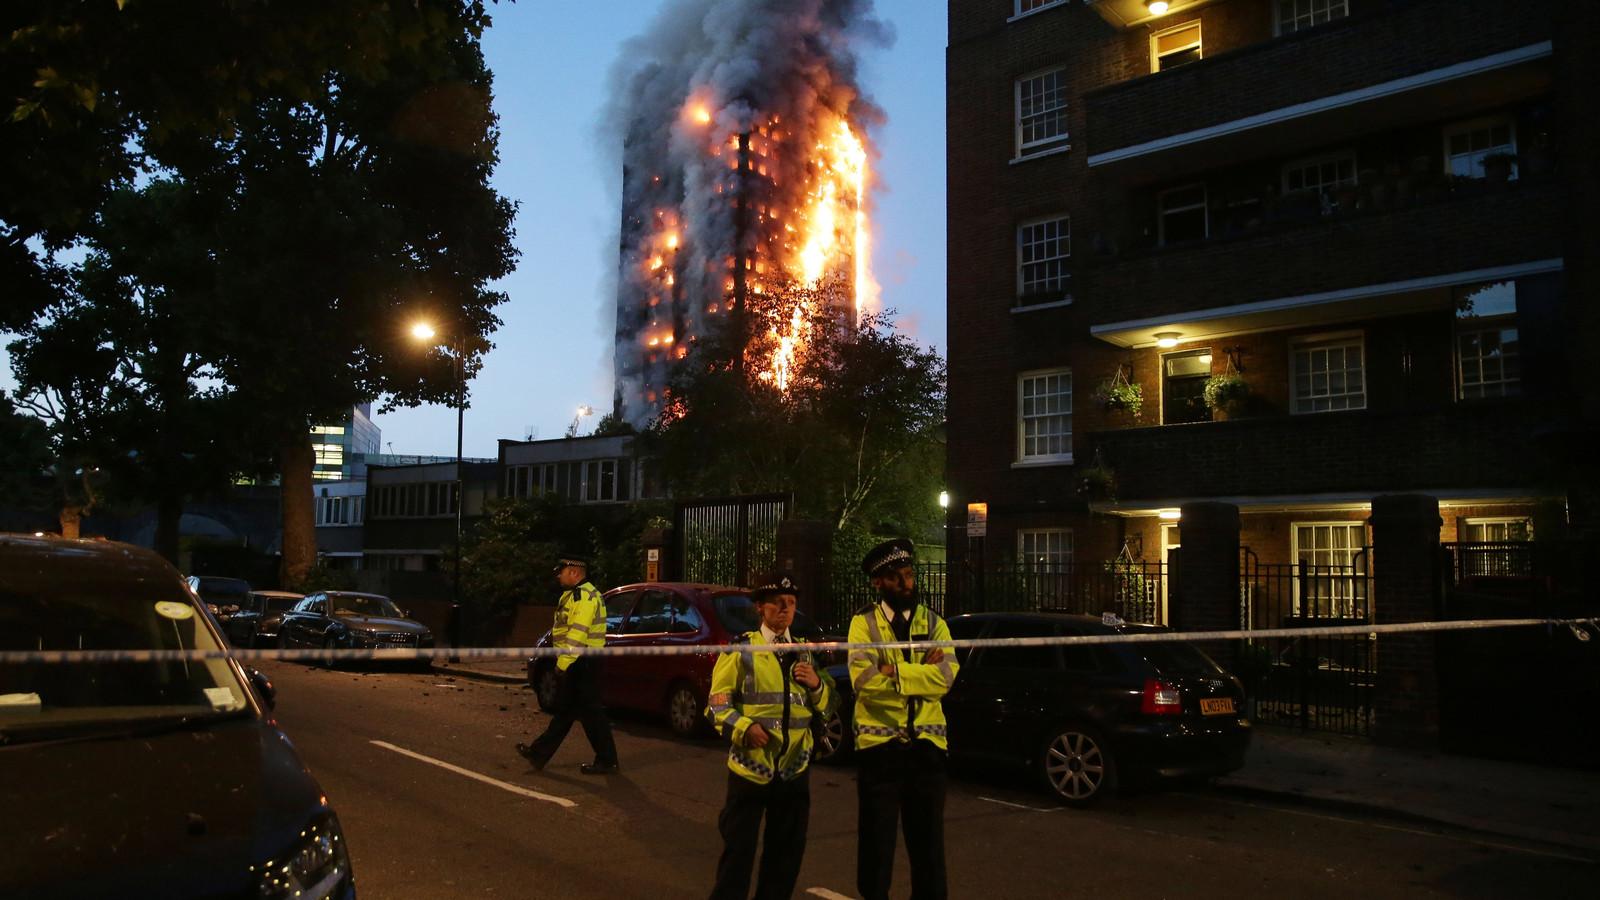 In juni 2017 stond de Grenfell Tower in Londen in brand.